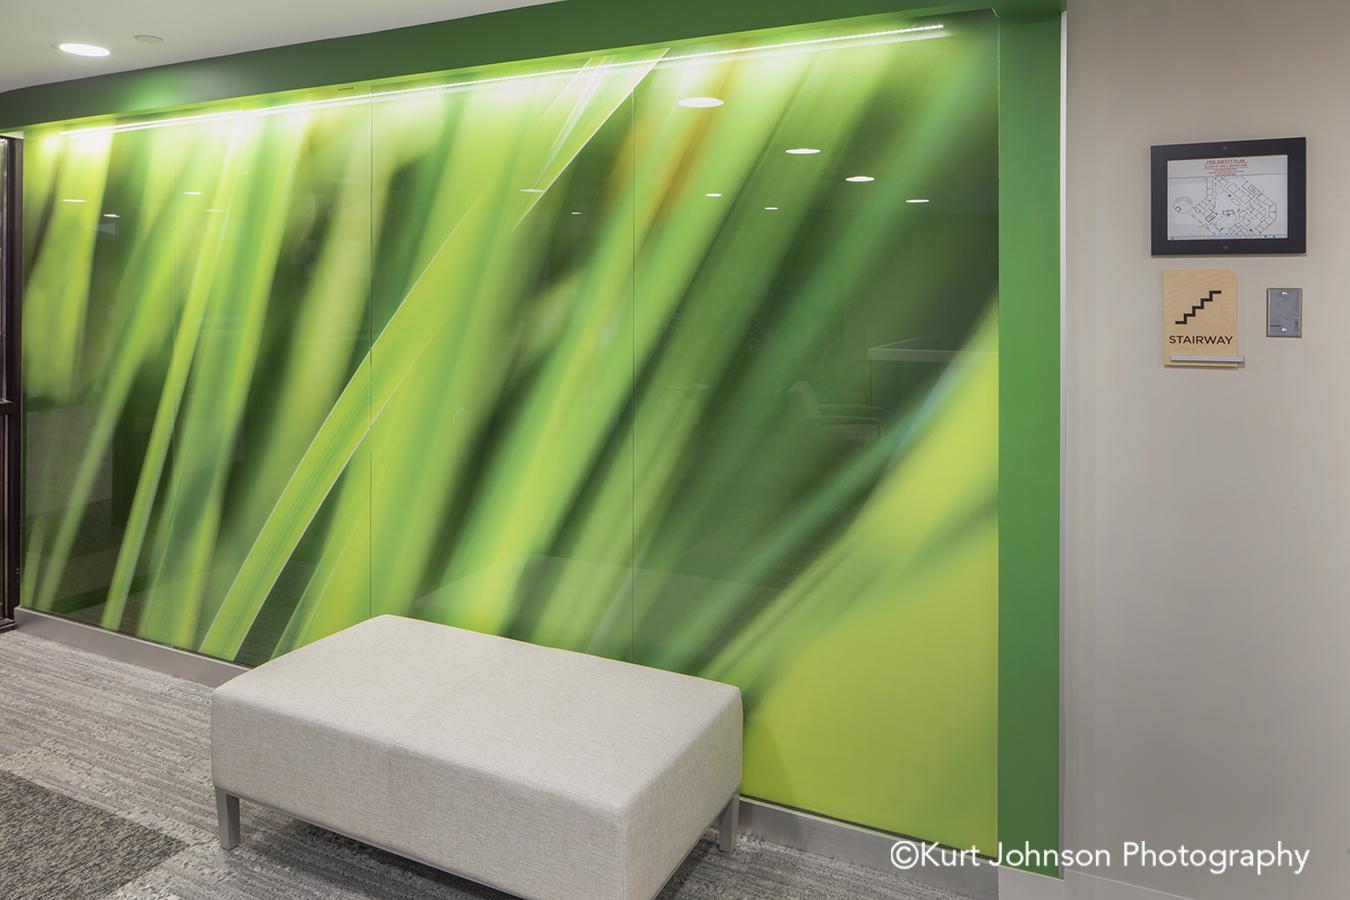 green grass grasses landscape install glass lobby waiting installation Allina Health United Healthcare John Nasseff Medical Center atrium InVision Glass Design